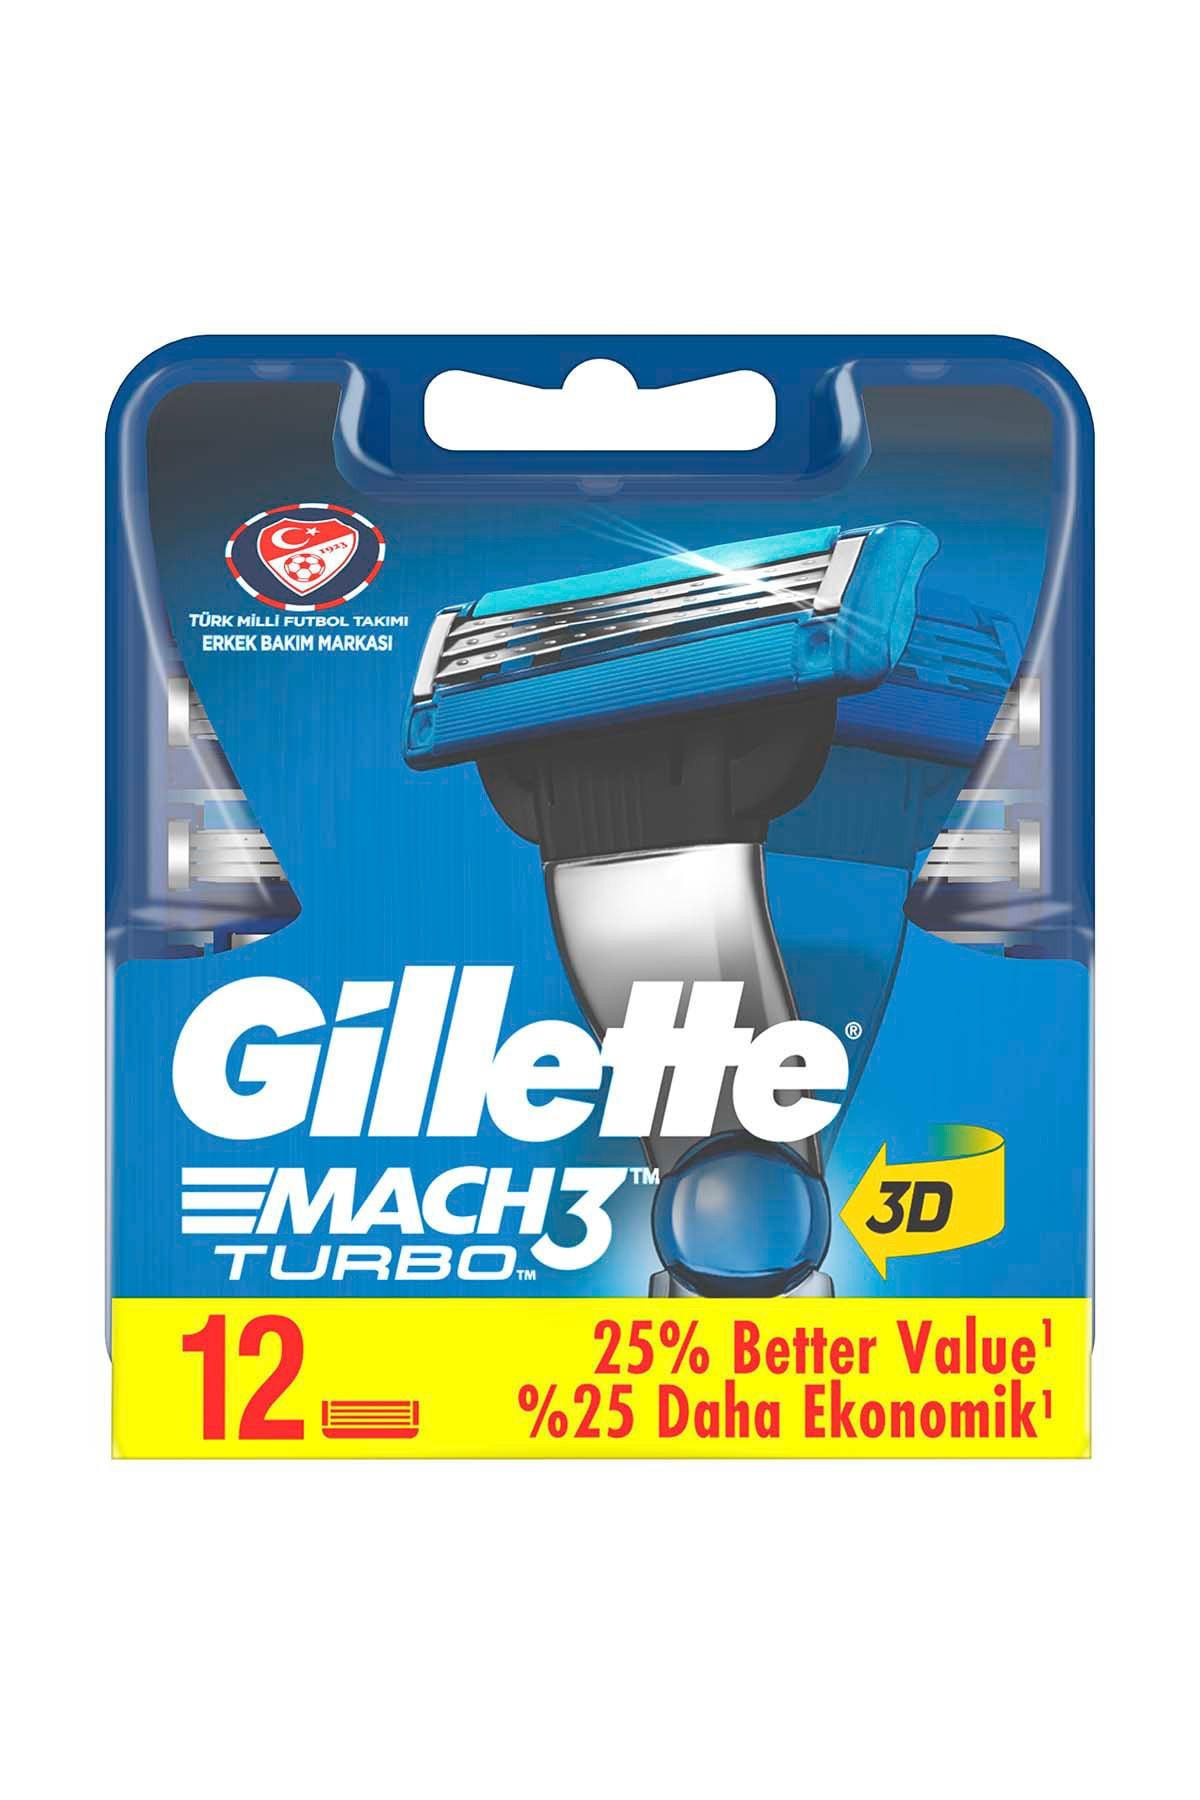 Gillette Mach3 Turbo Yedek Tıraş Bıçağı 12'li 2